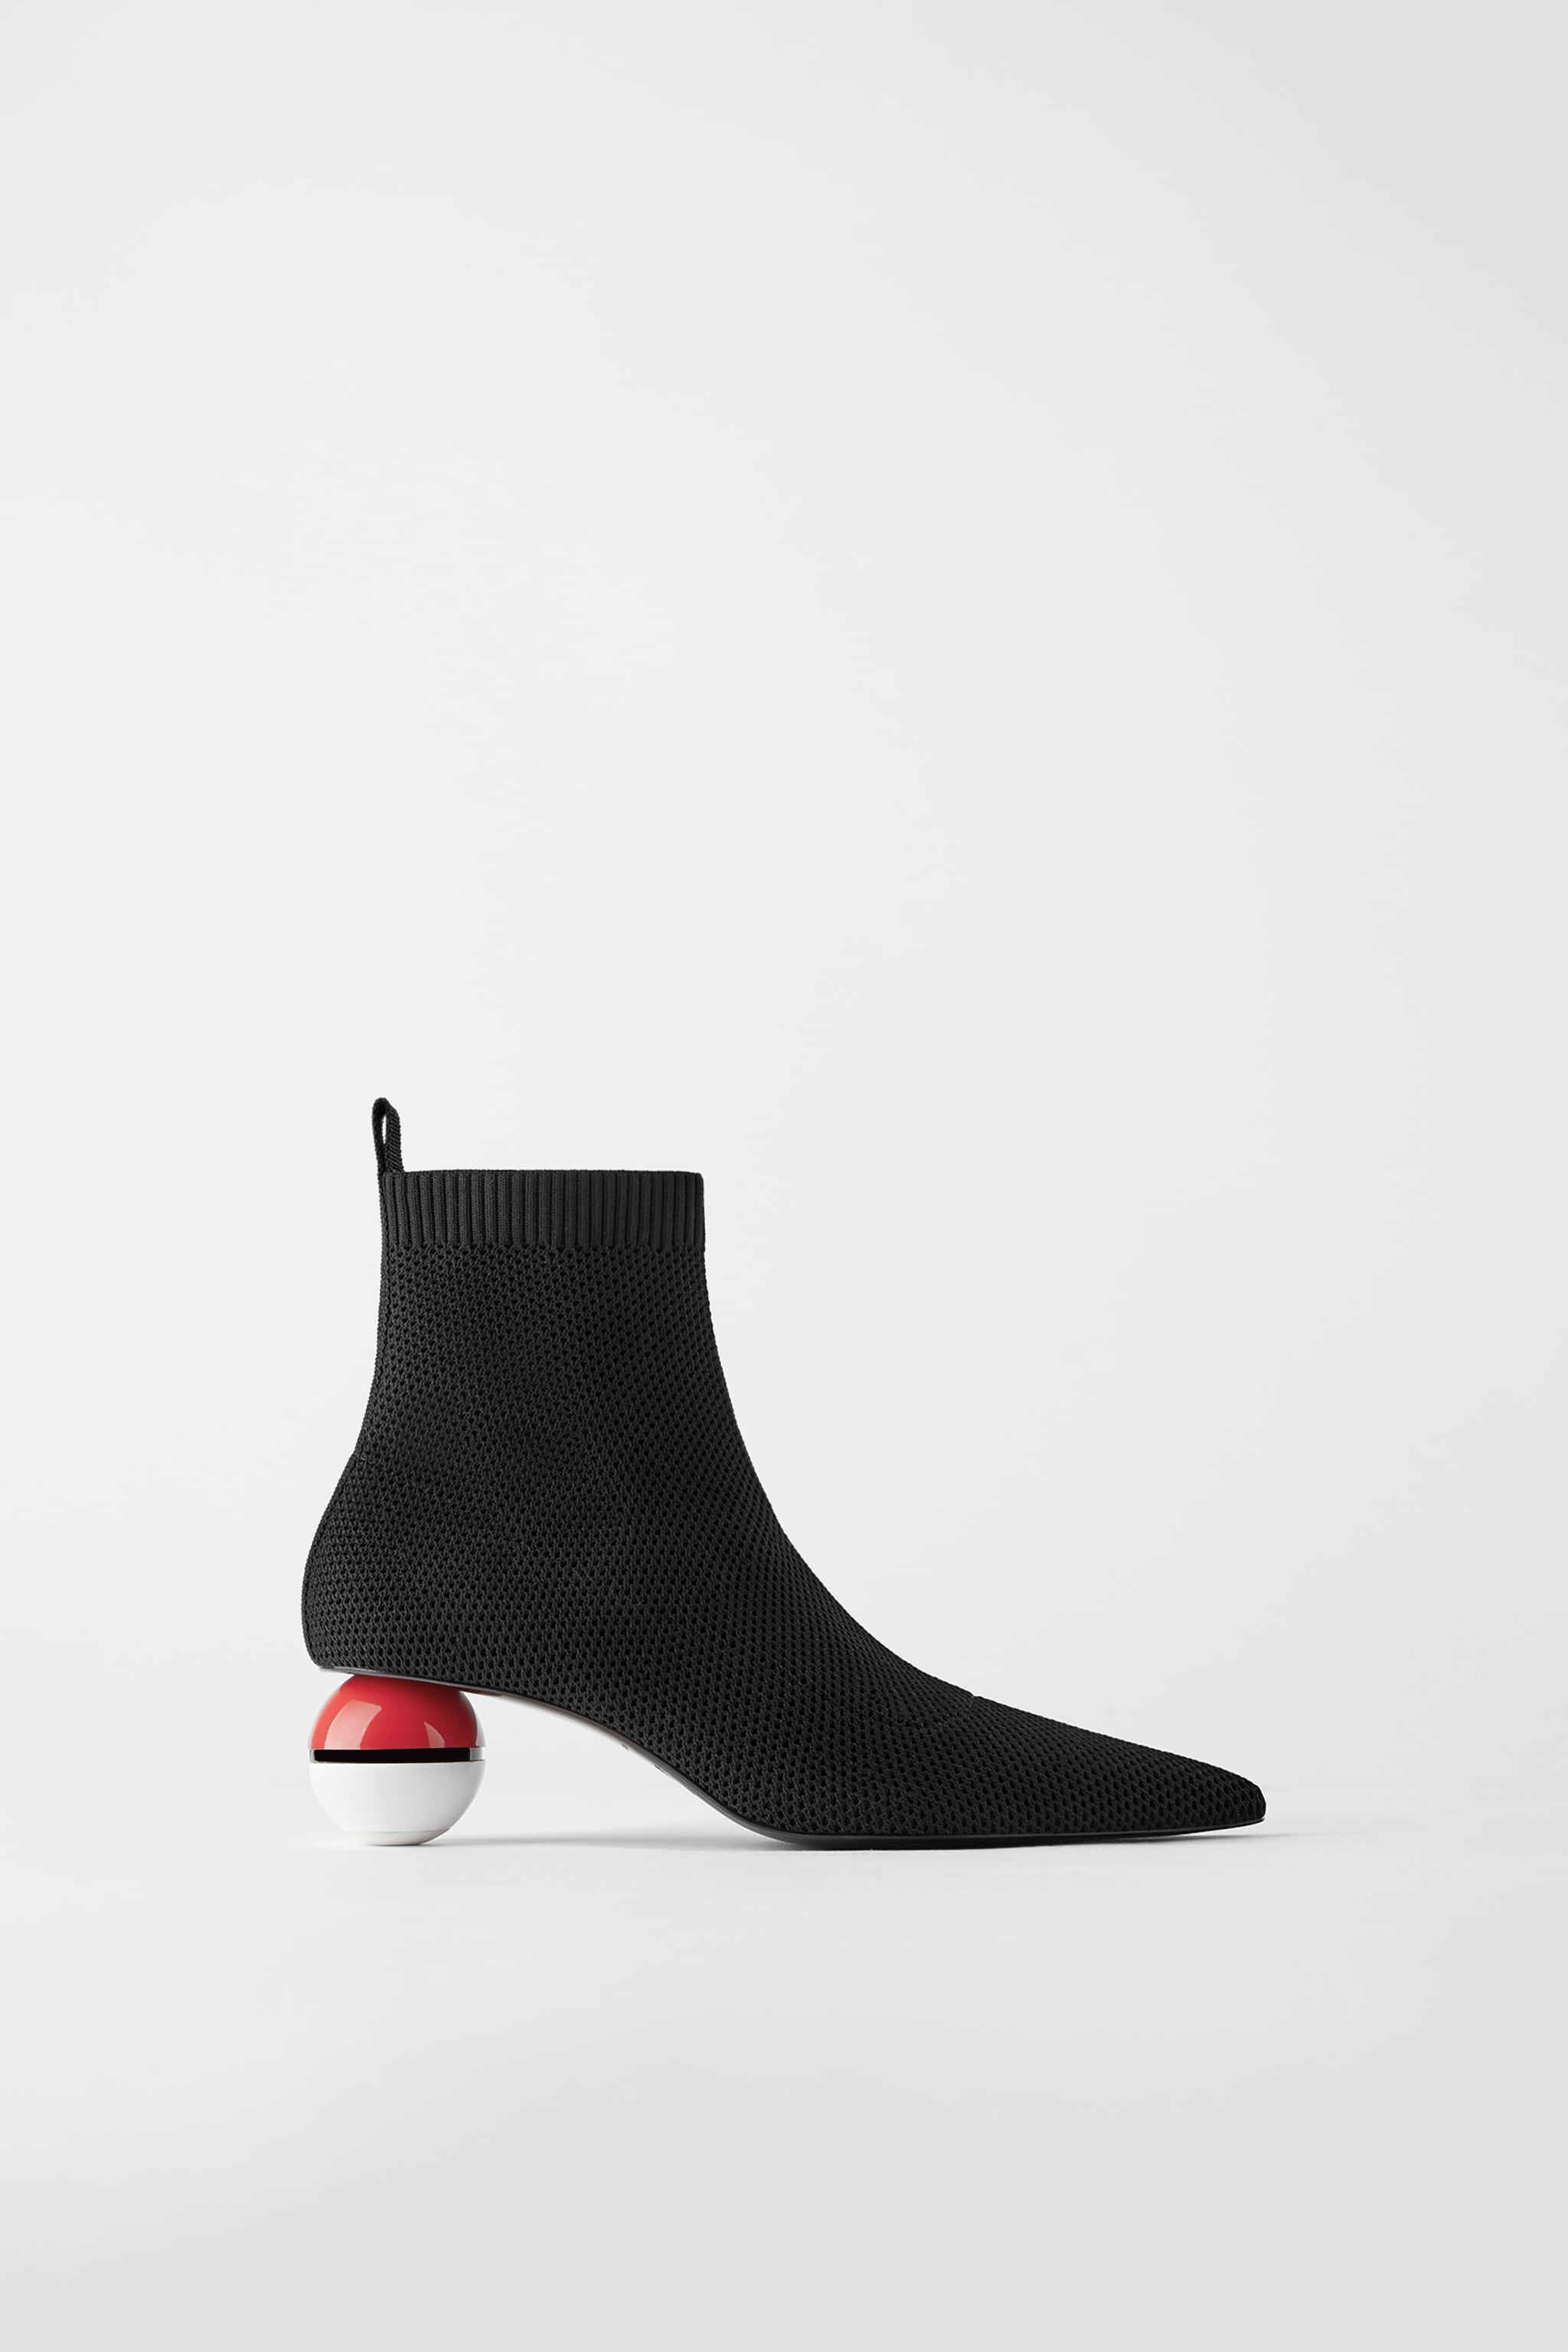 Zara kengät Poképallo jalkineet